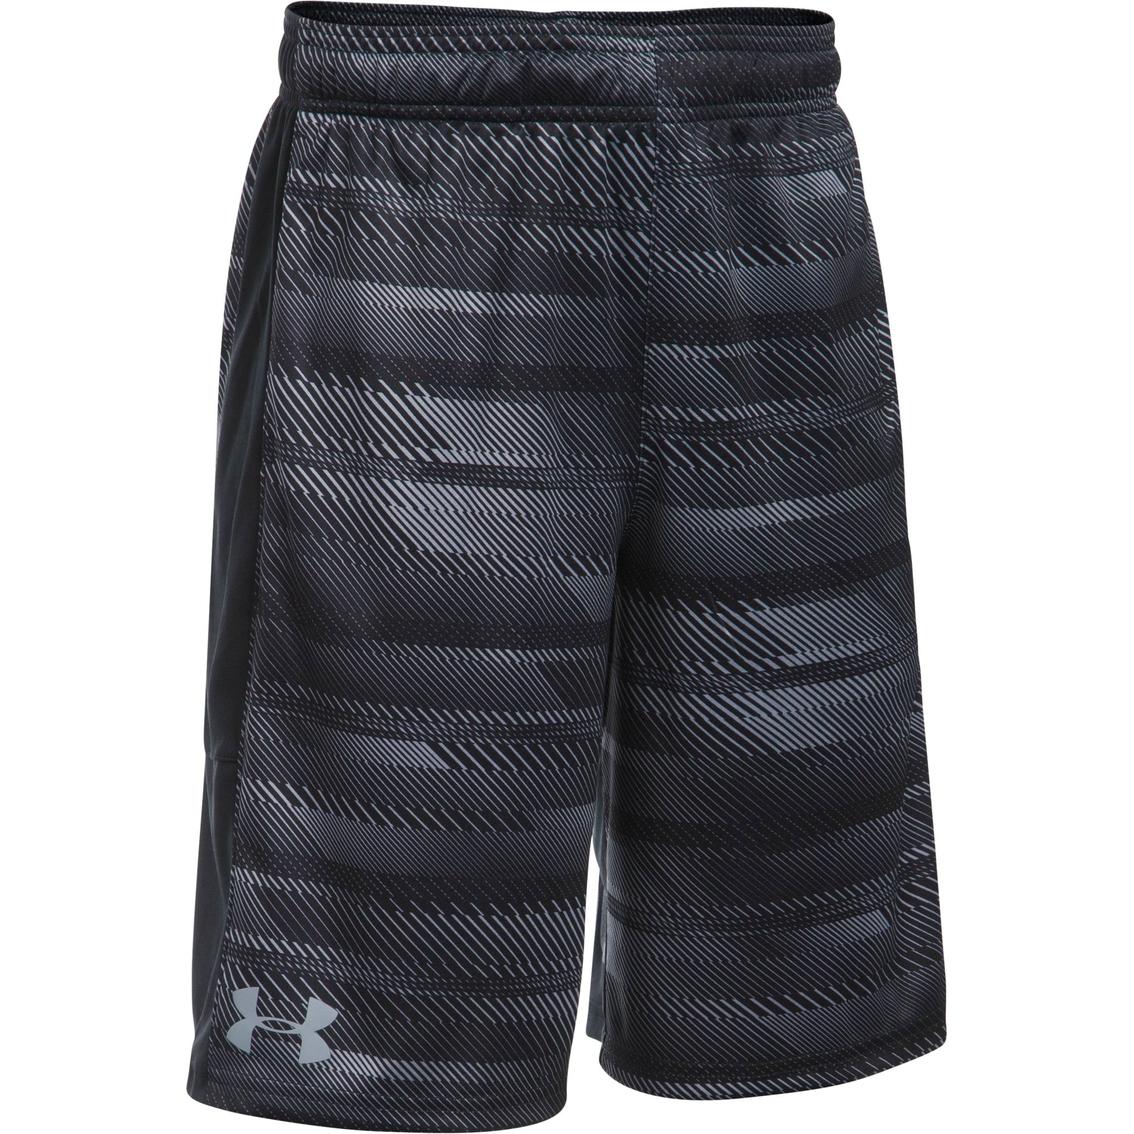 becdb441b Under Armour Boys Ua Stunt Printed Shorts | Boys 8-20 | Apparel ...